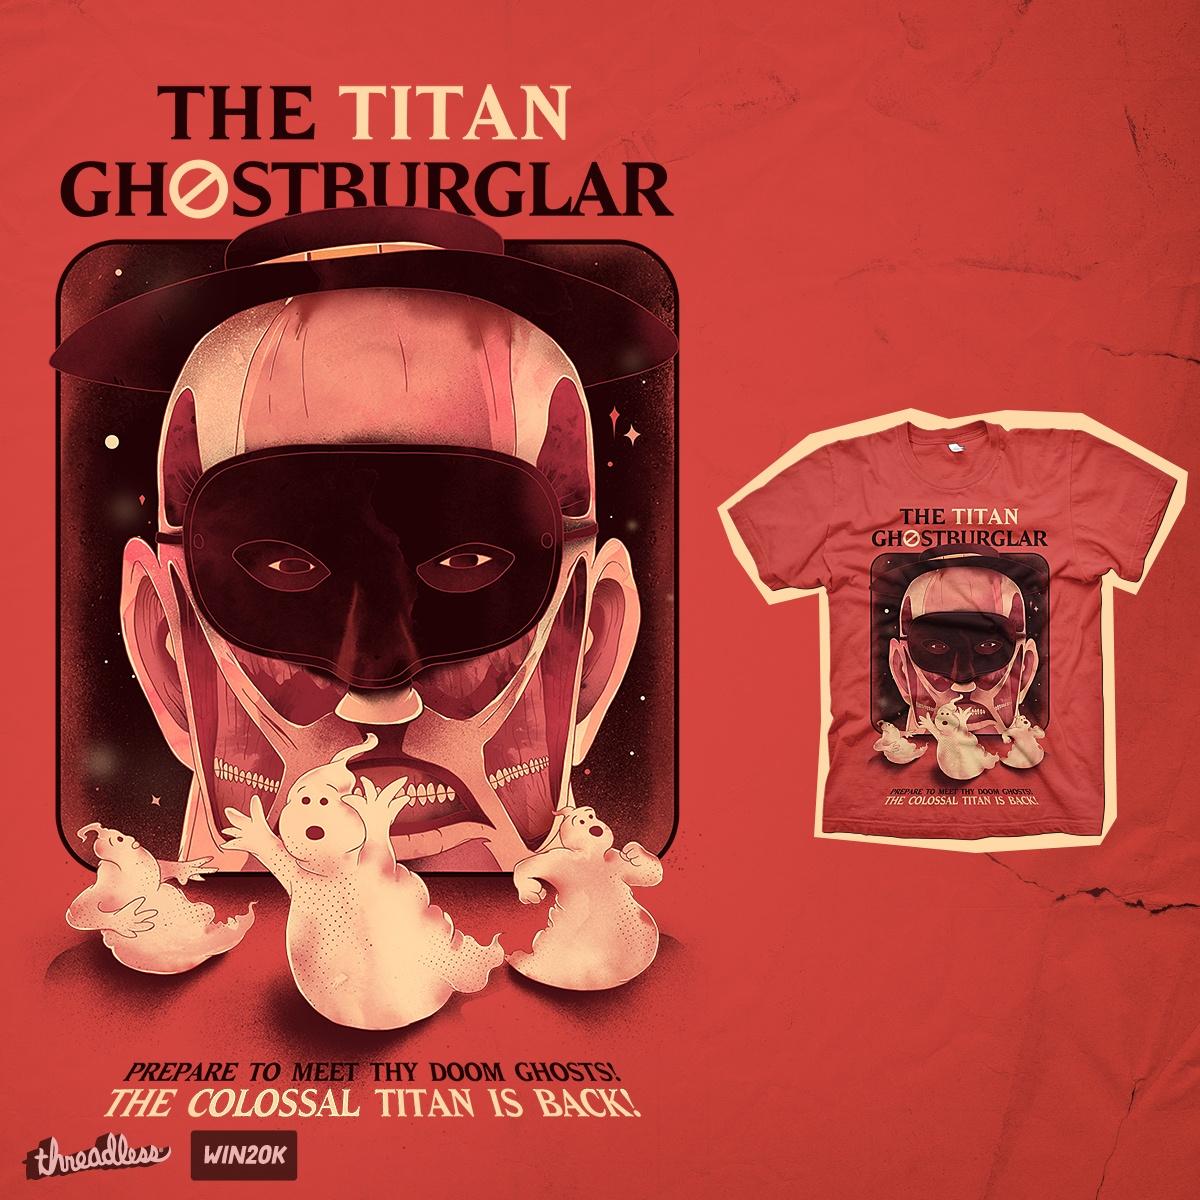 GhostBurglar by choppre on Threadless